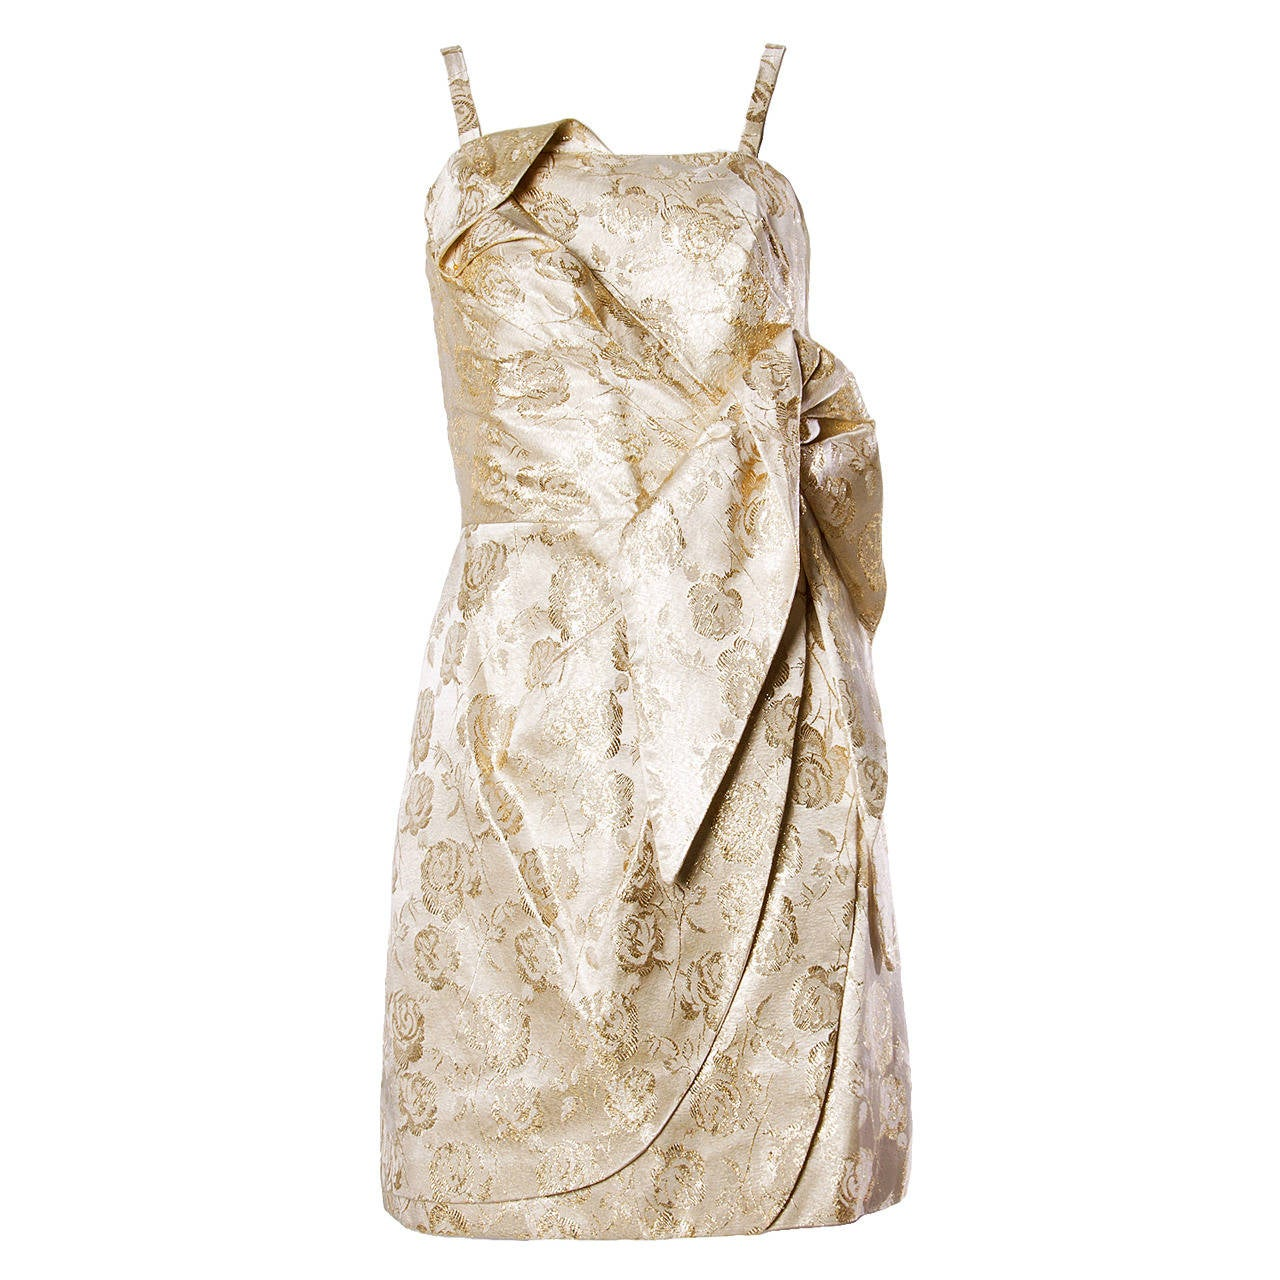 Lilli Diamond Vintage 1960s Metallic Brocade Sculptural Cocktail Dress